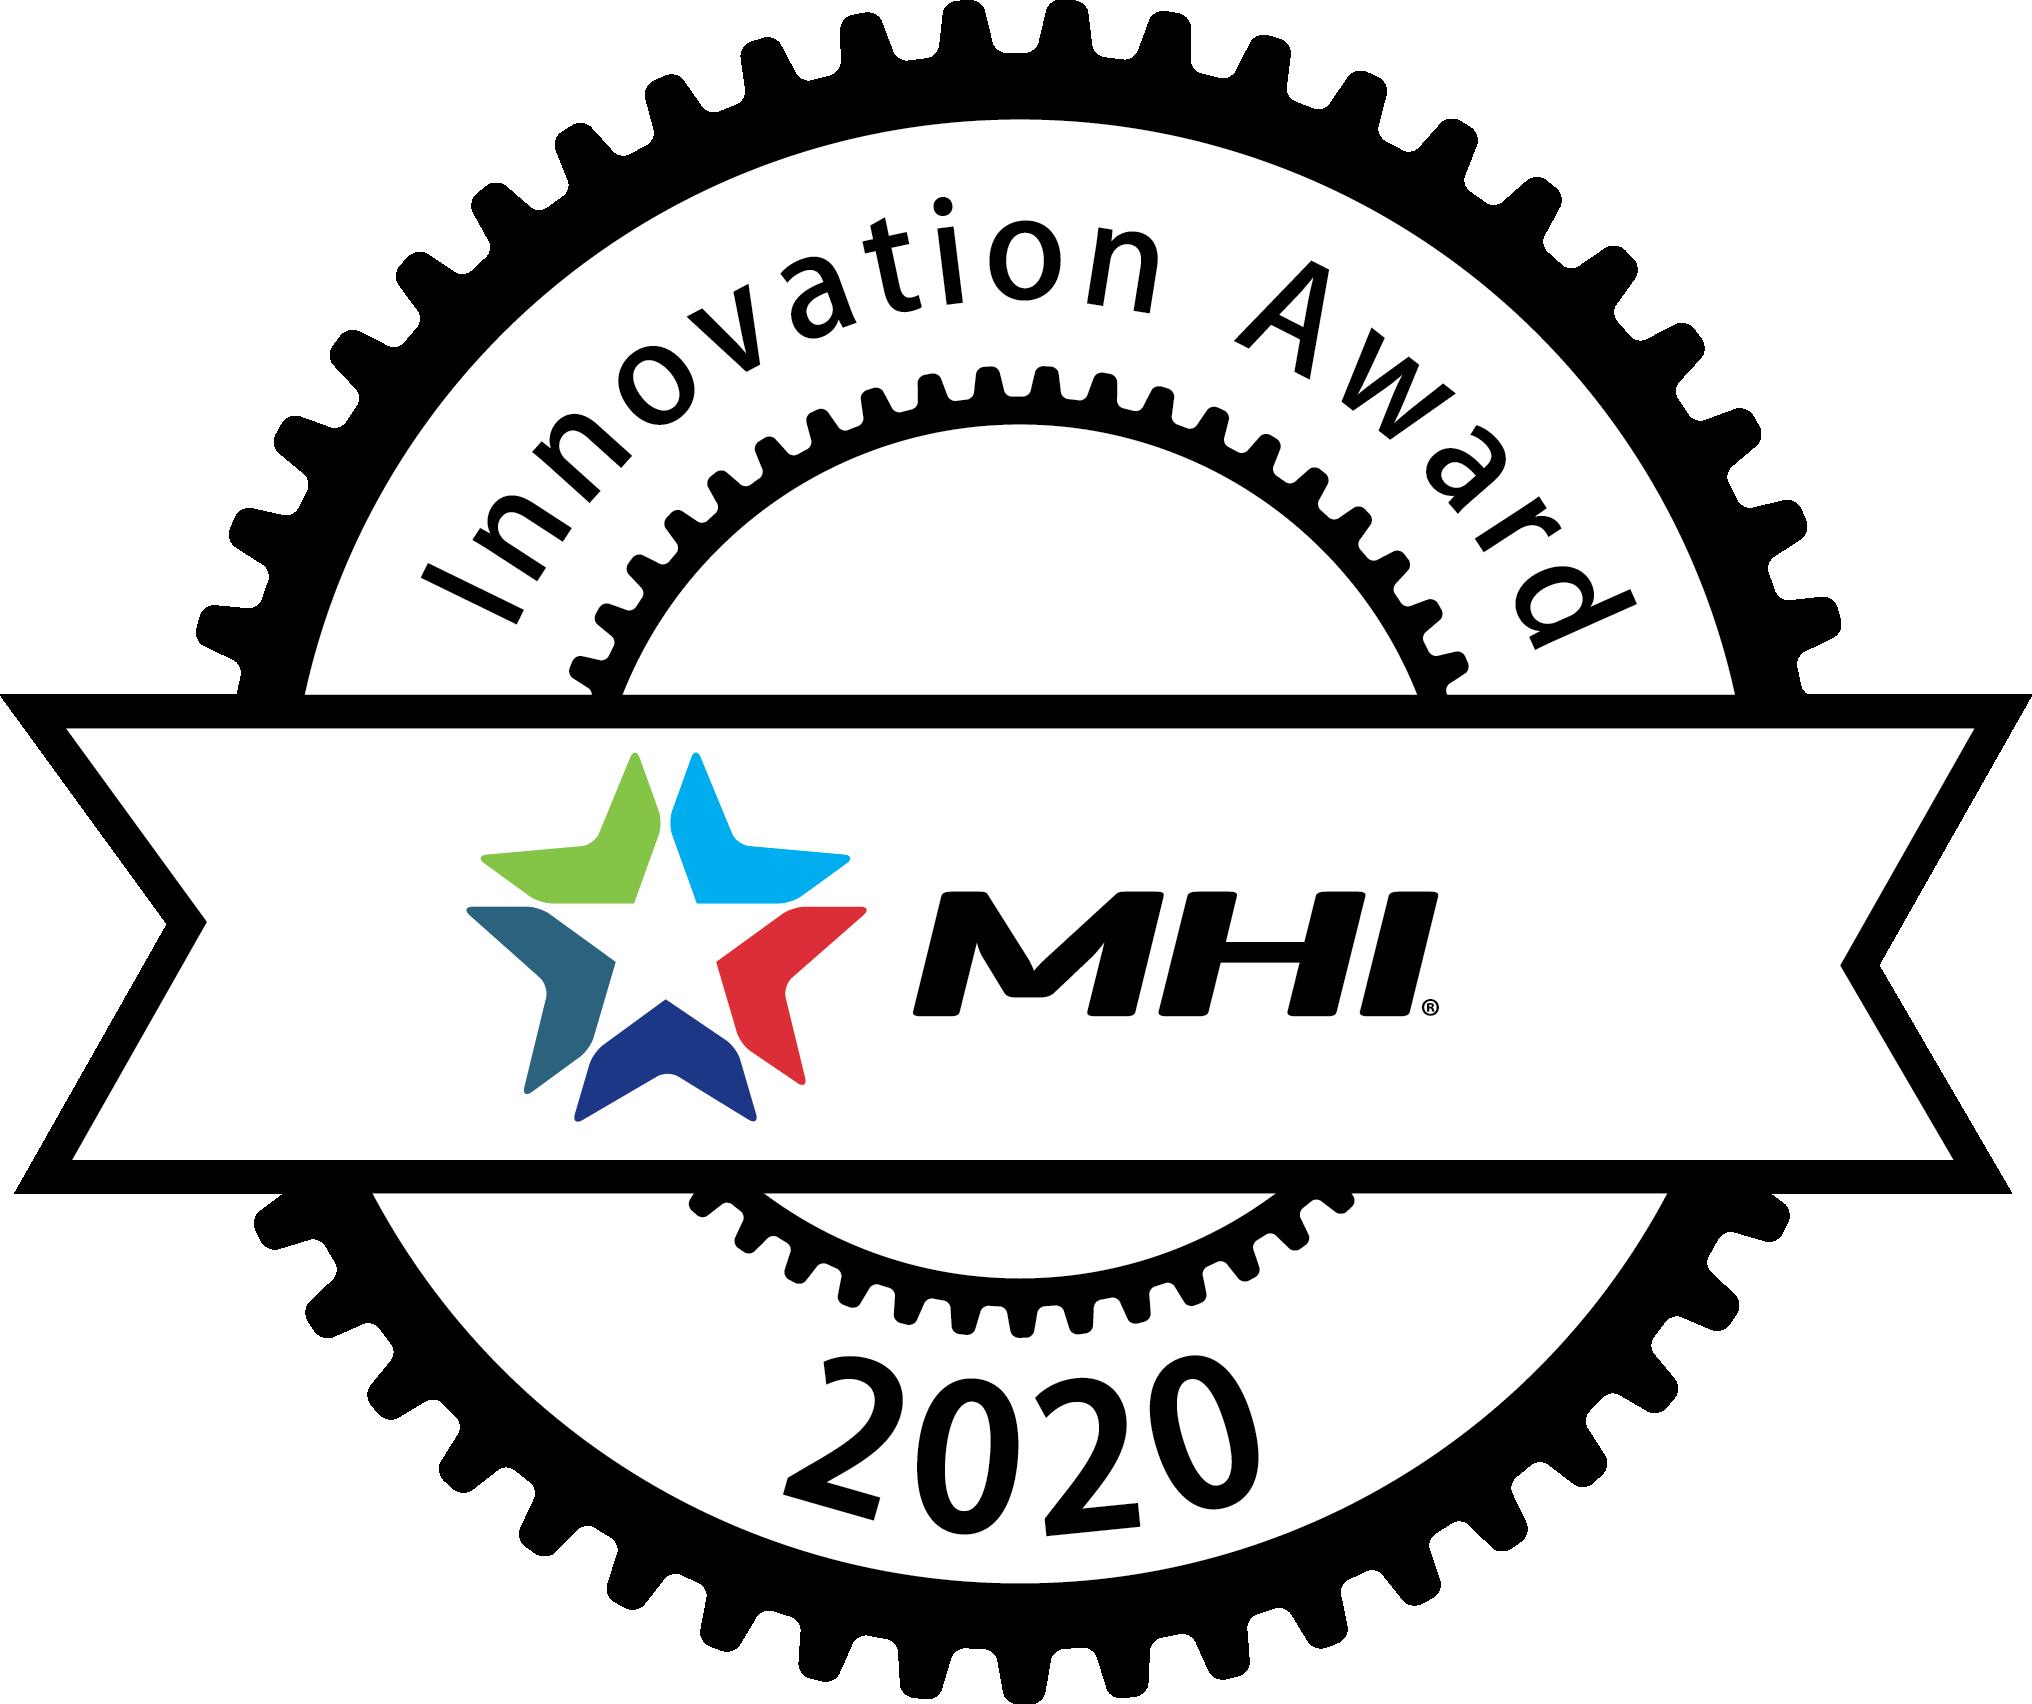 PINC is a 2020 MHI Innovation Award Finalist